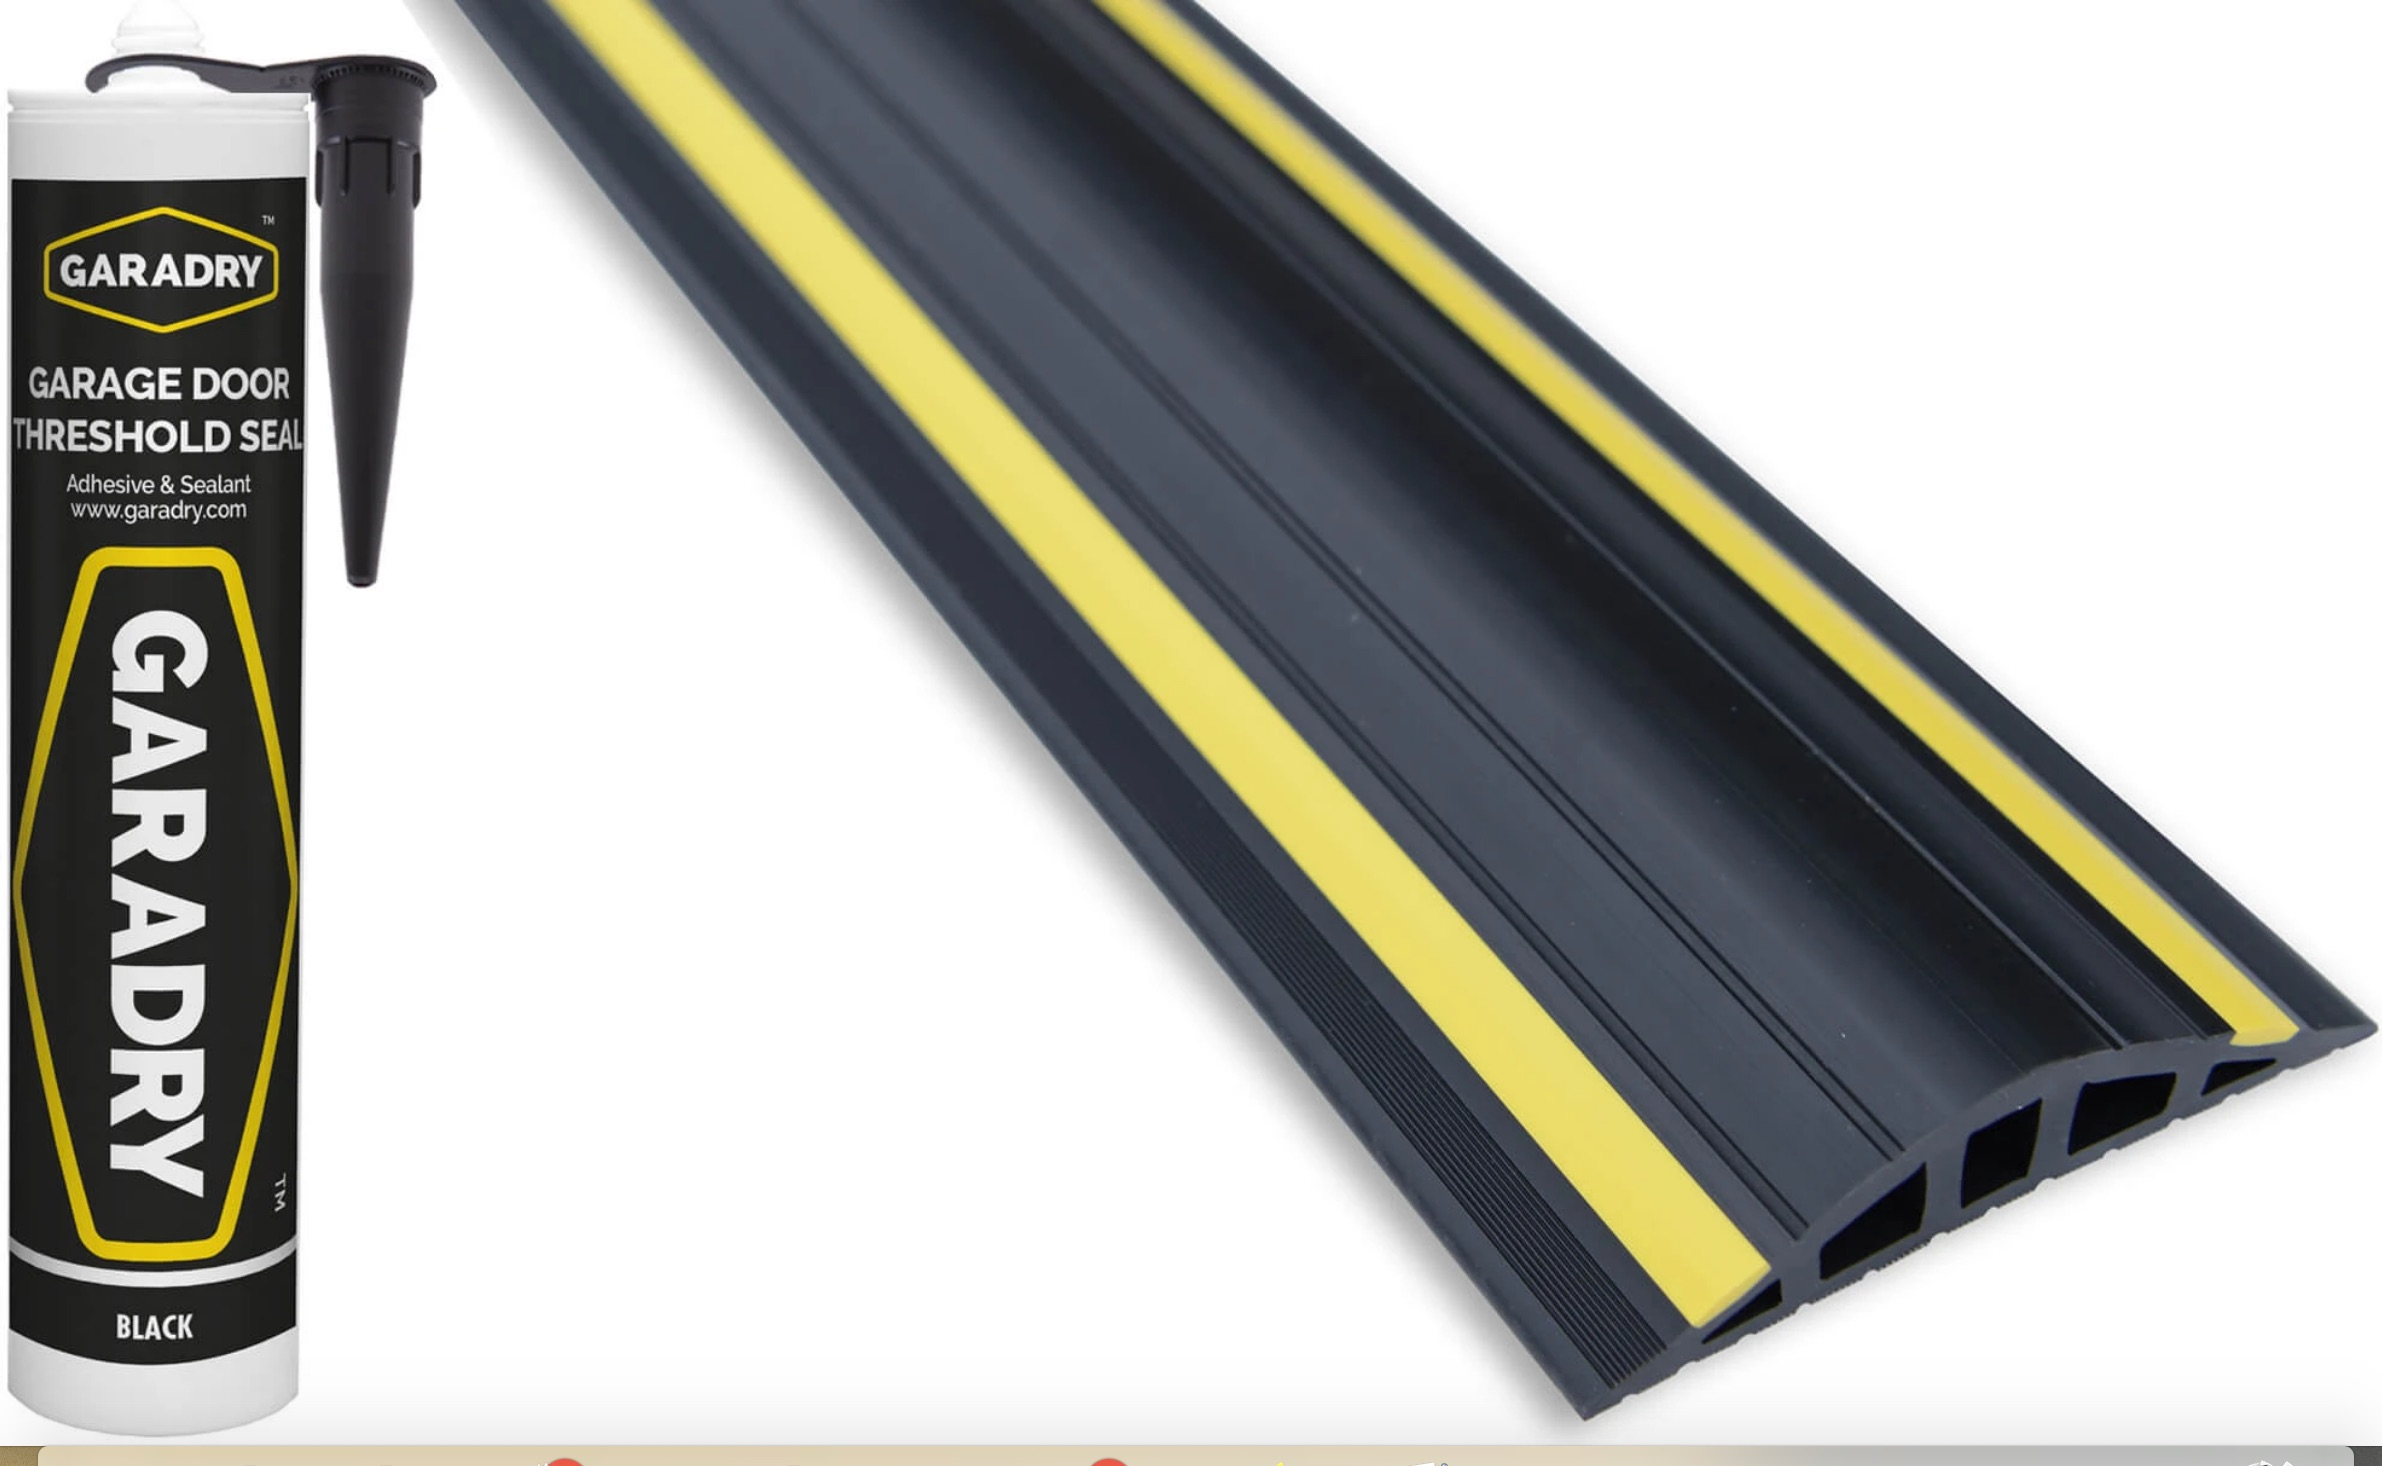 25mm High x 3.73m - 12 foot 3 Long 2 x adhesives